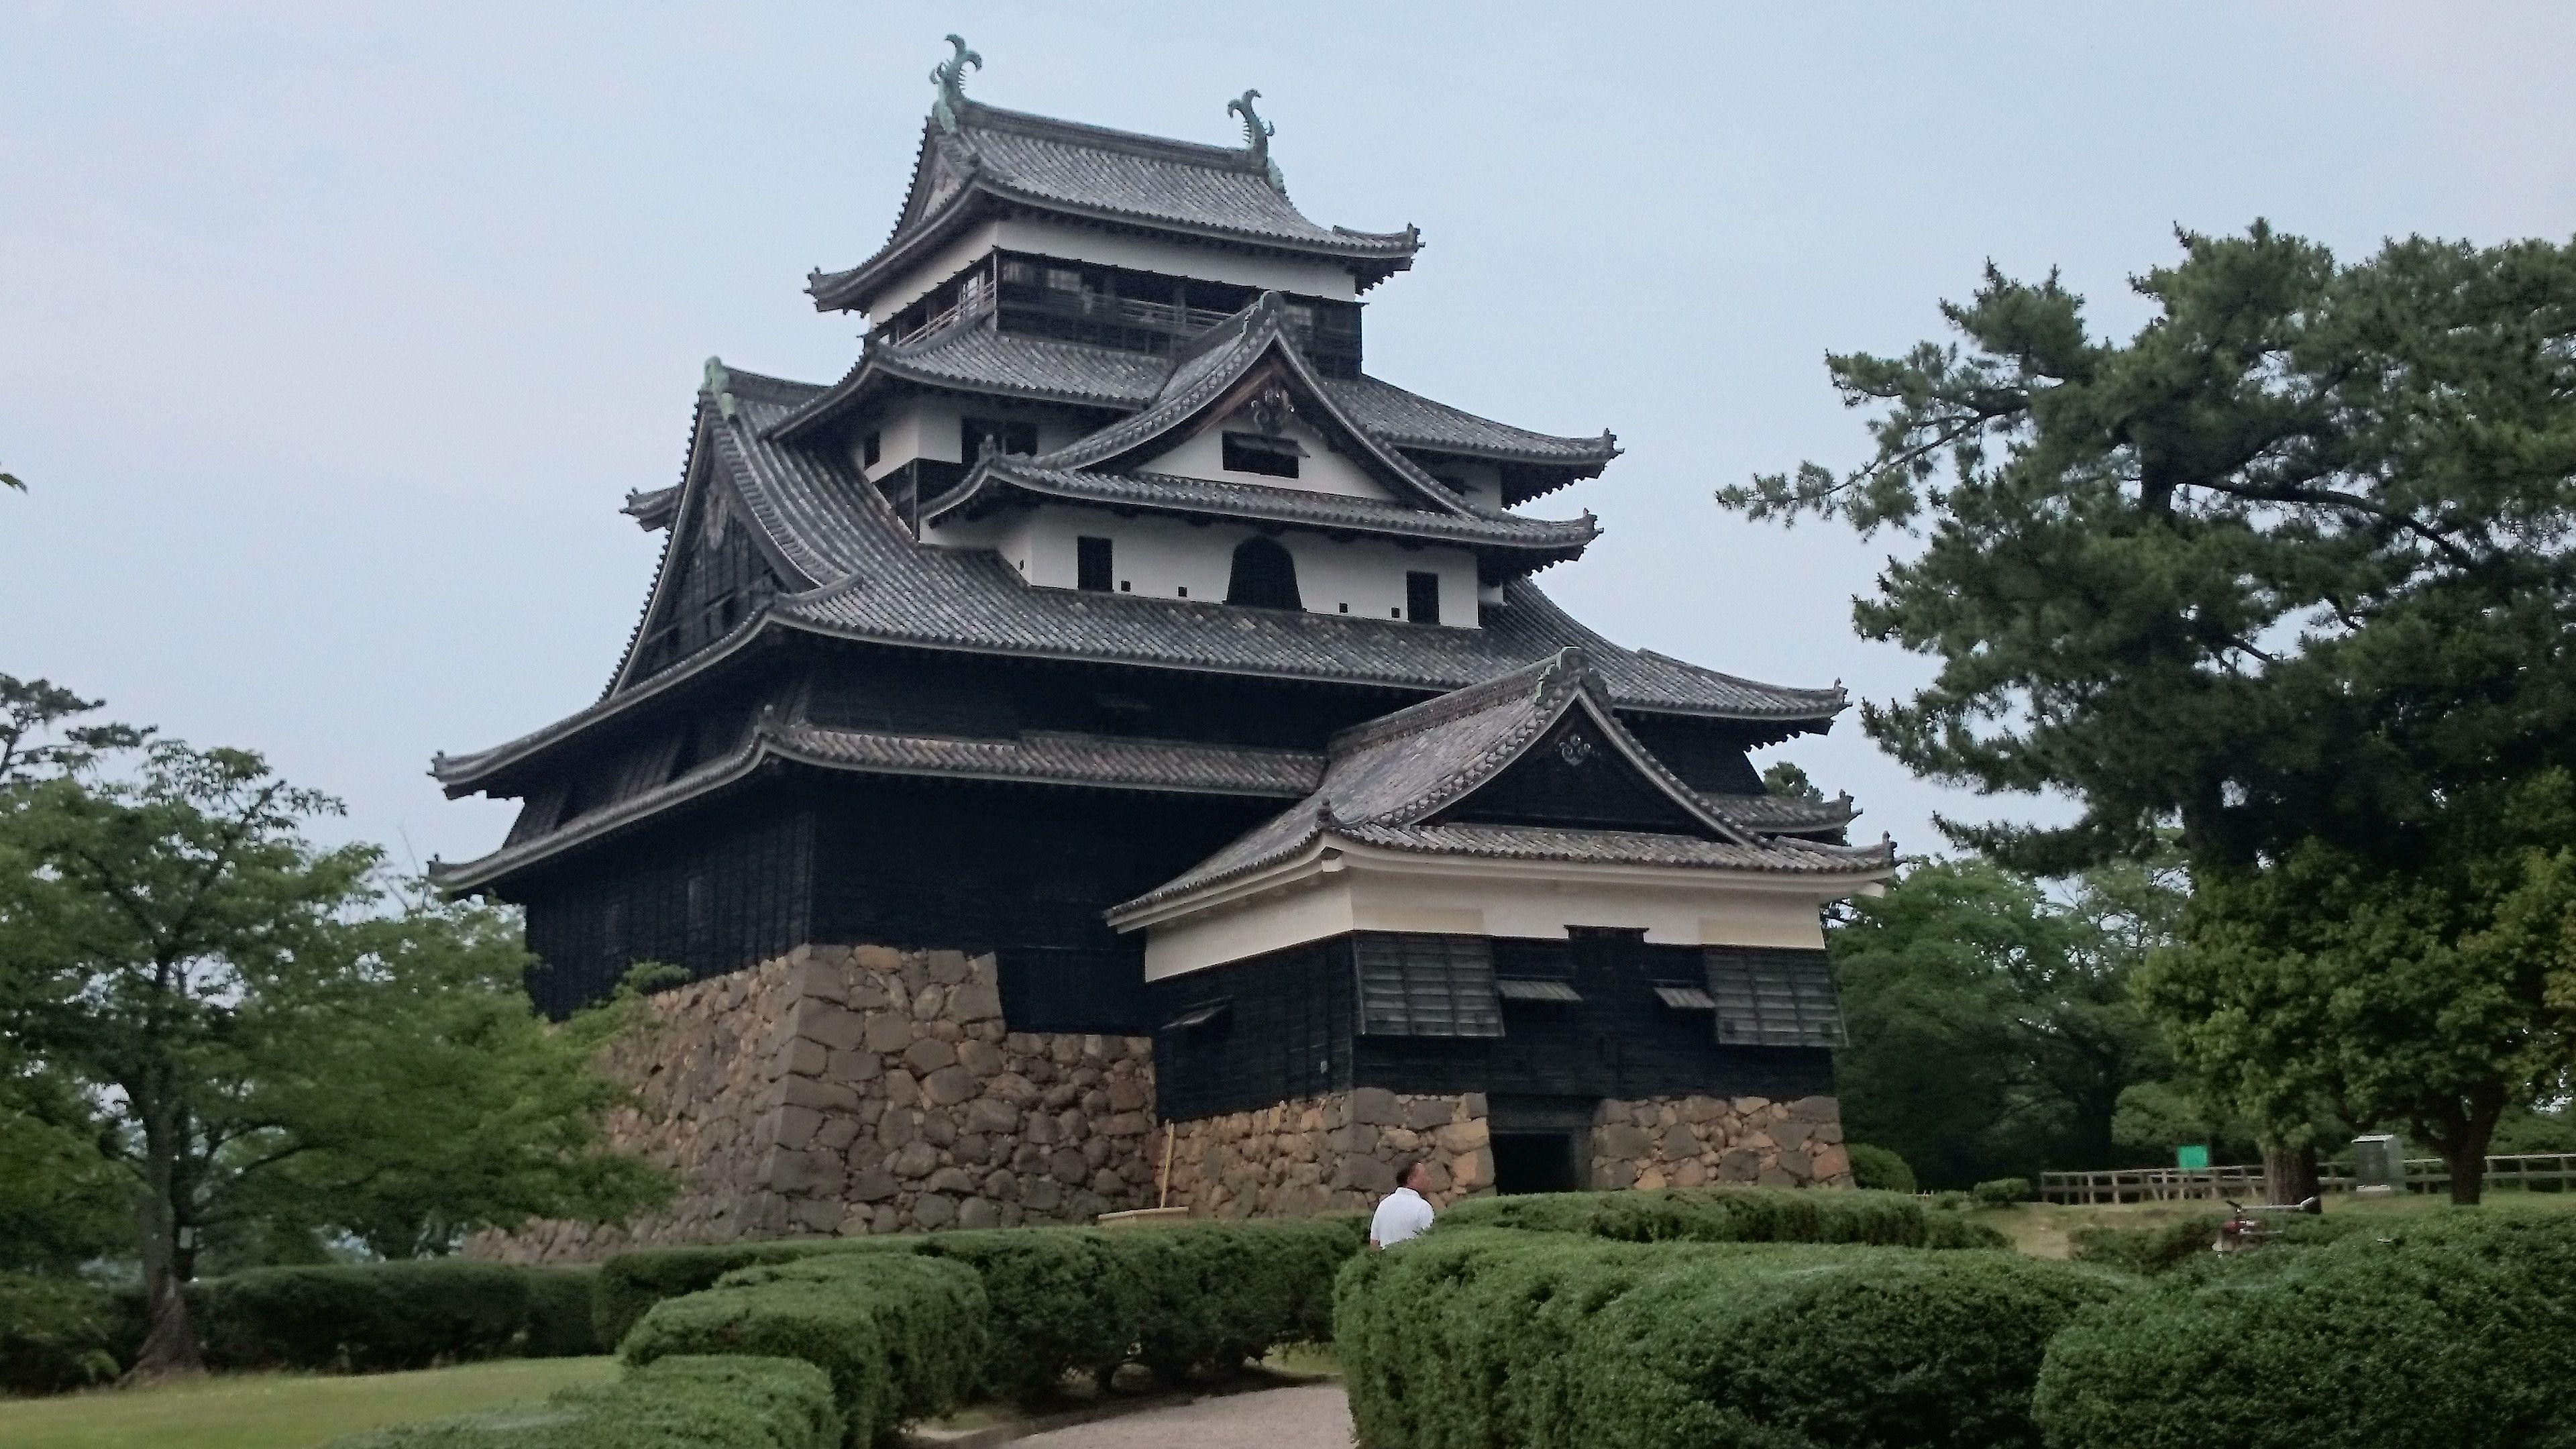 松江市・松江城 MatsueCastle Matsue ShimanePref. #松江城 #島根 #Matsue #Shimane